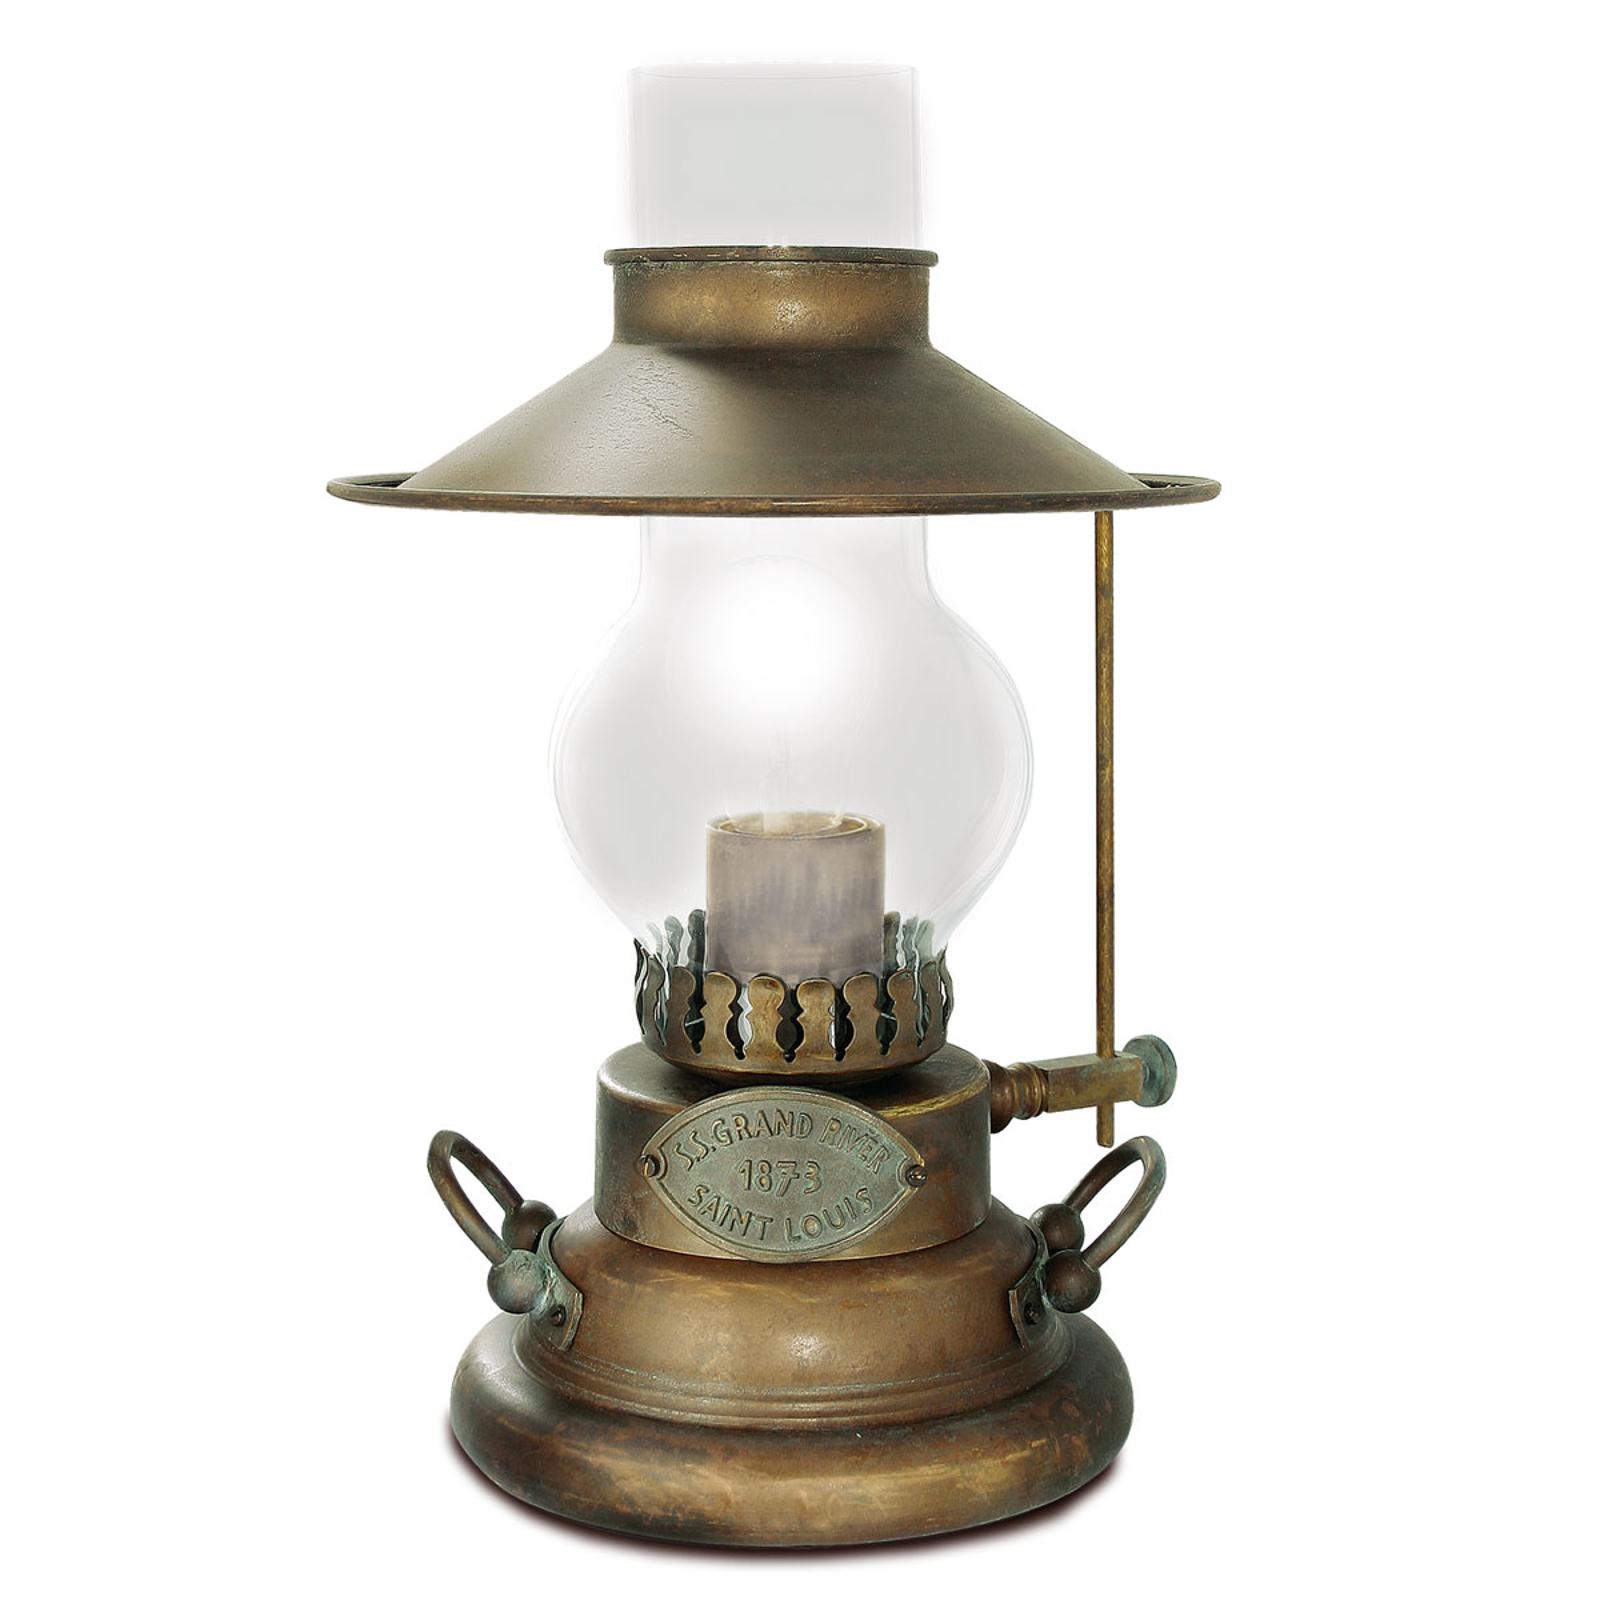 Bordlampe Guadalupa fra gamle tider.